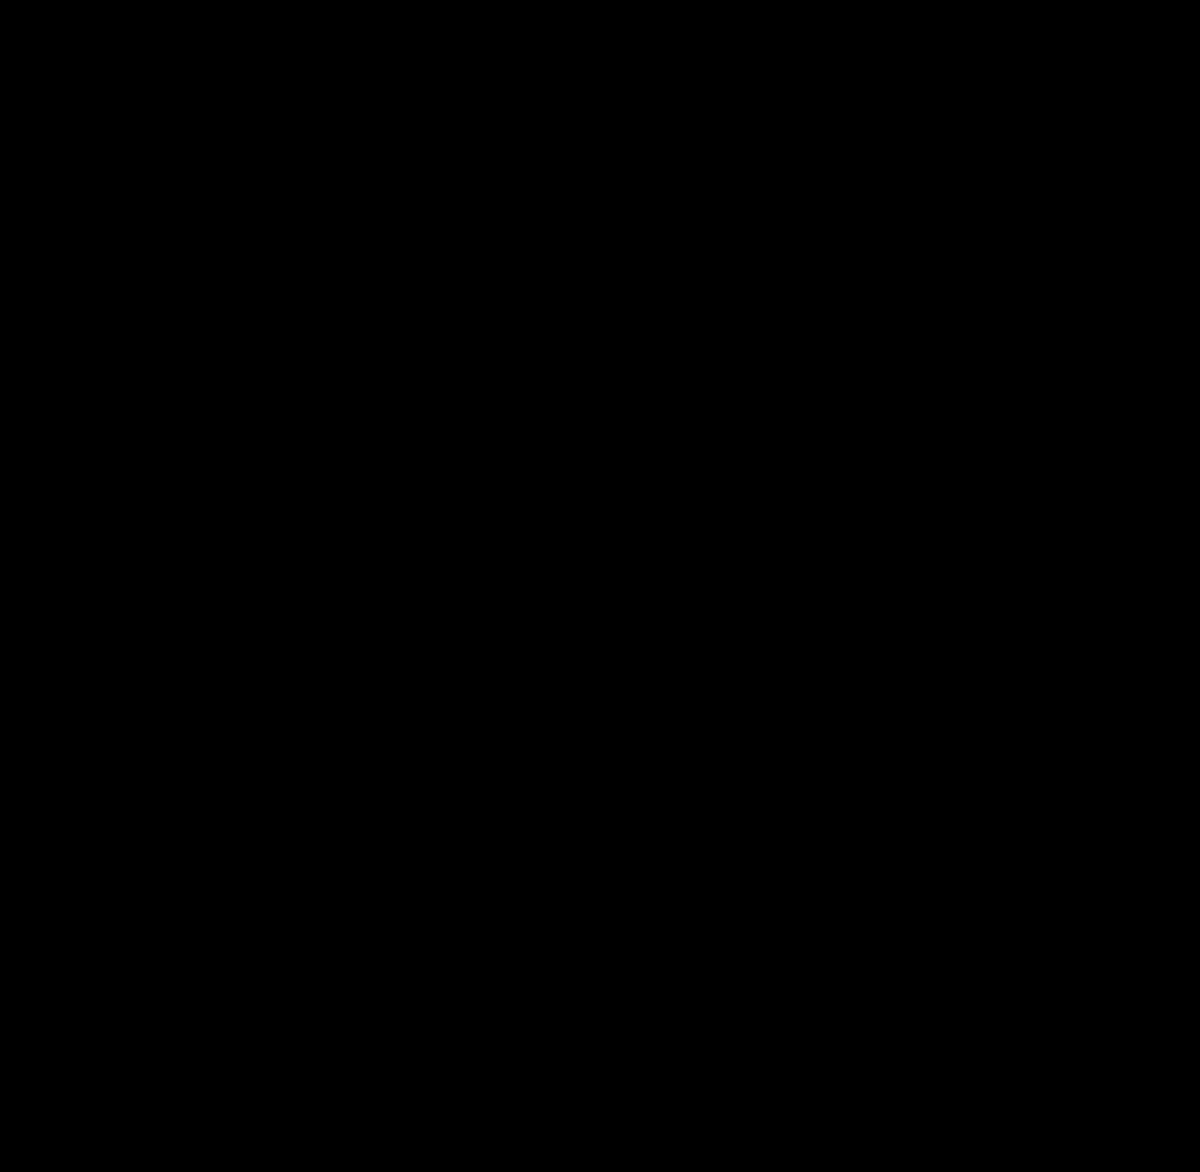 Auto Sleutel – Stash plek – Geheim – Sleutelhanger – Festival – Zwart – 1 stuk